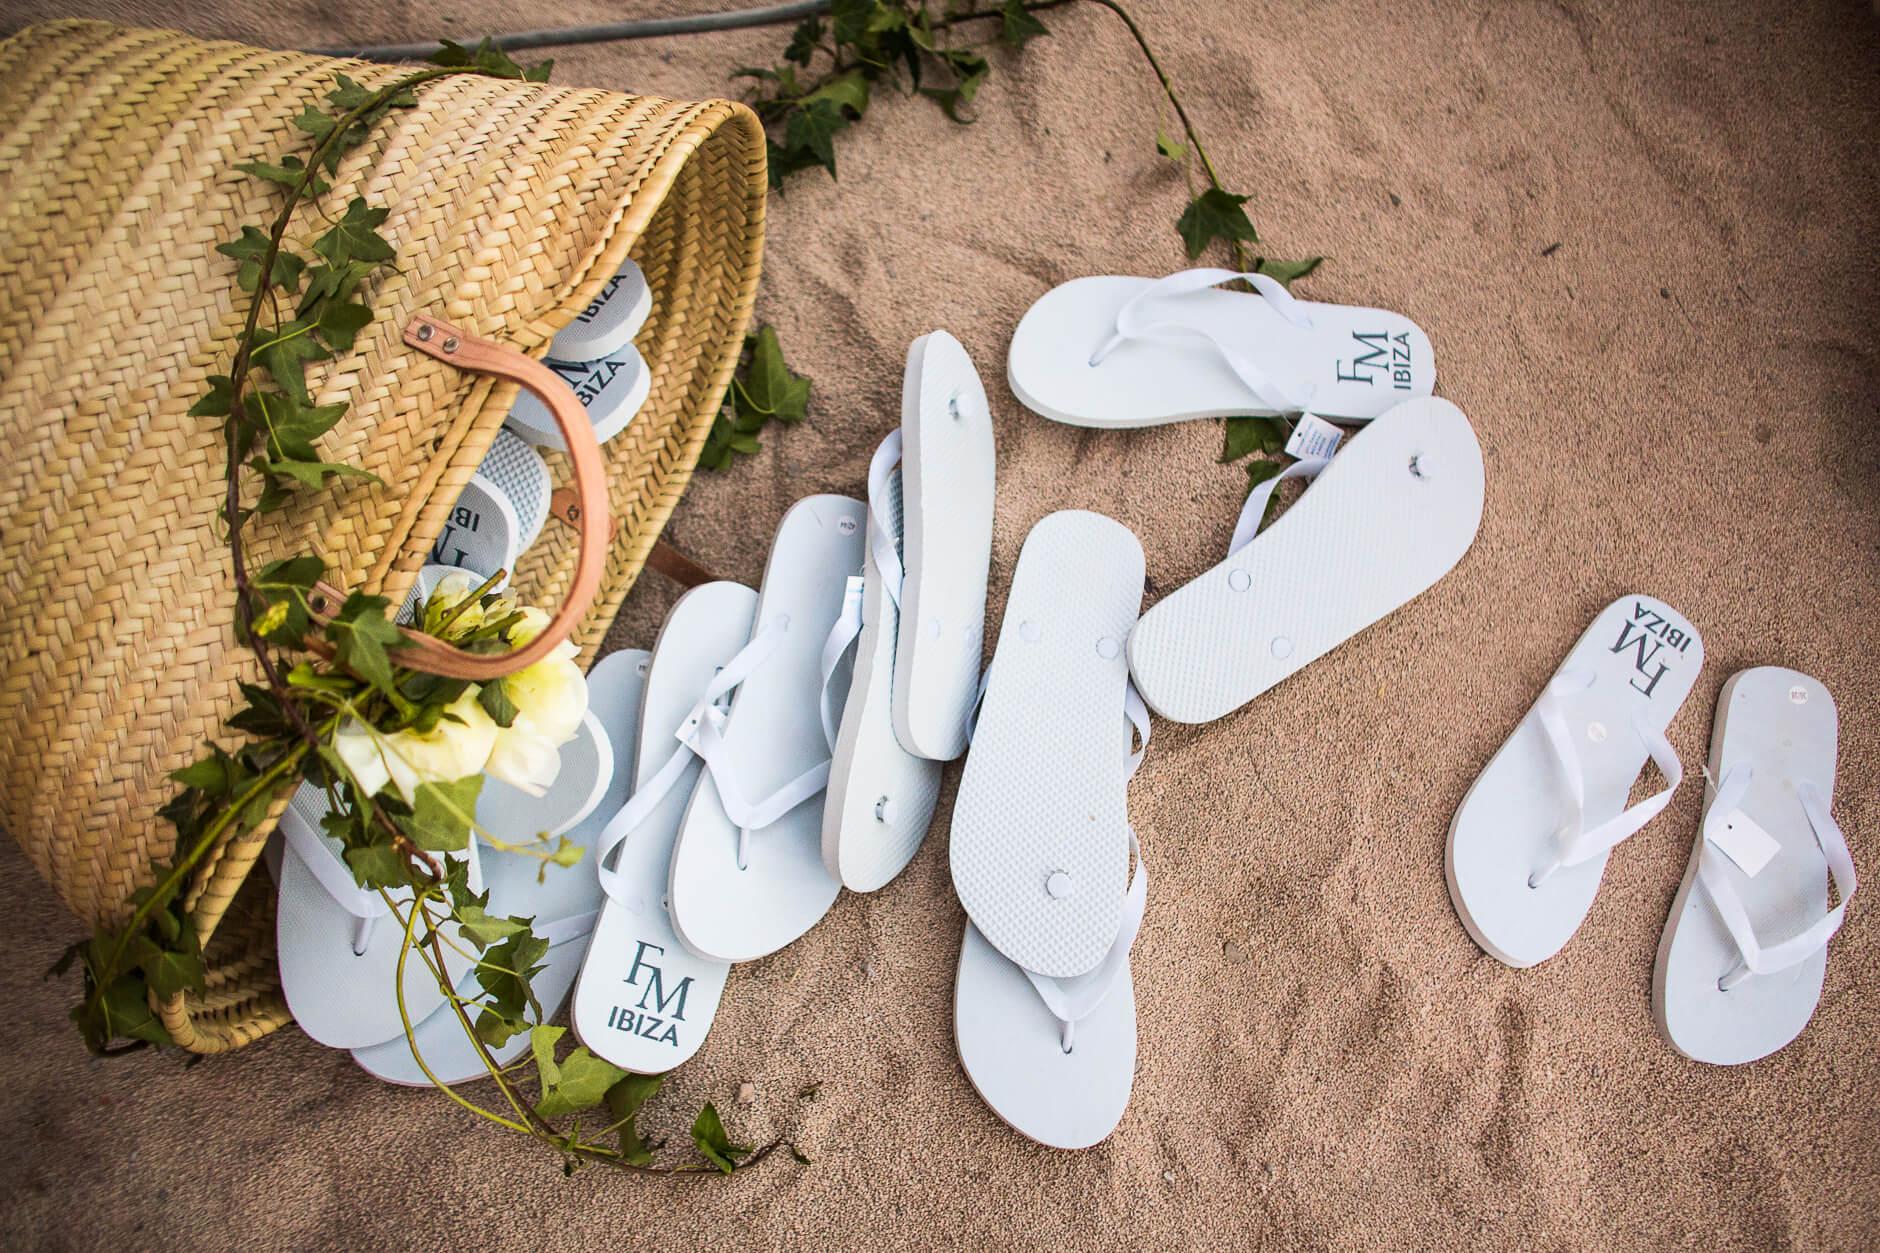 matrimonio in spiaggia idee